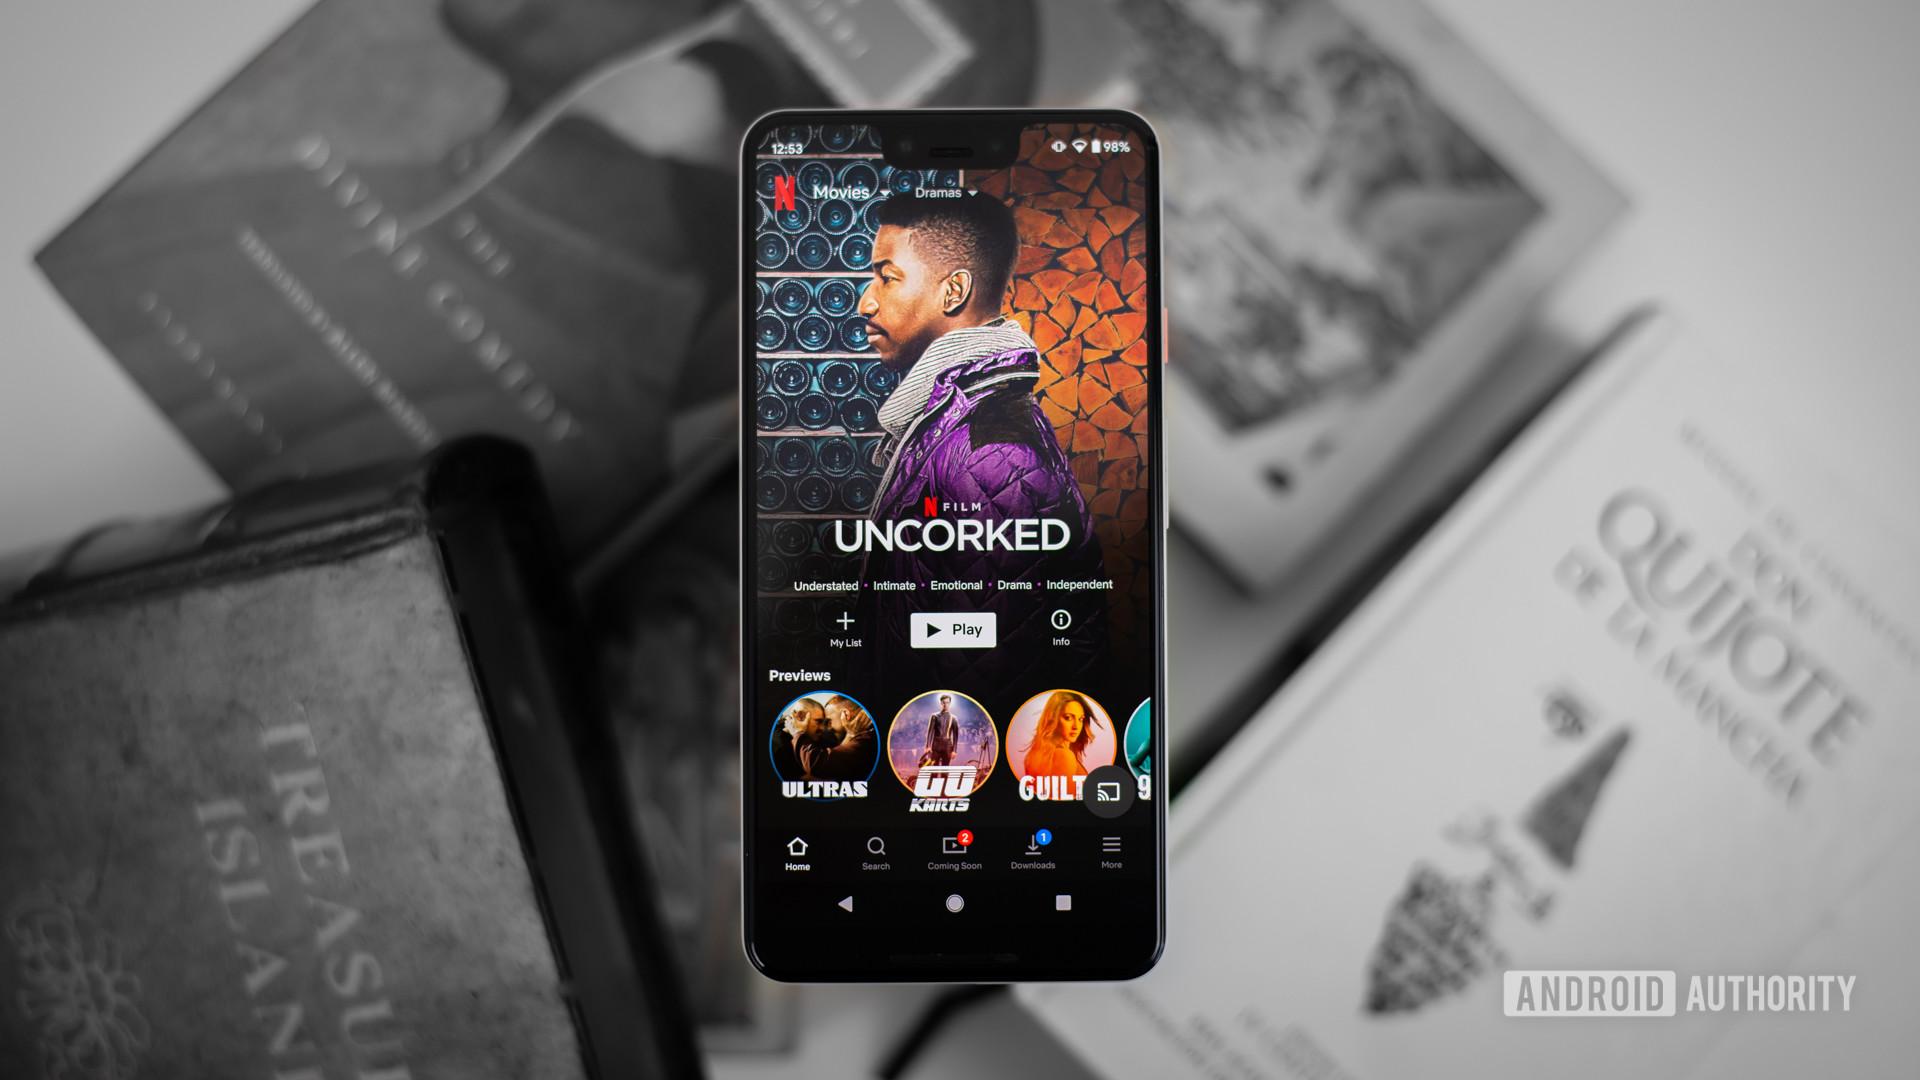 Netflix dramas on smartphone stock photo 1